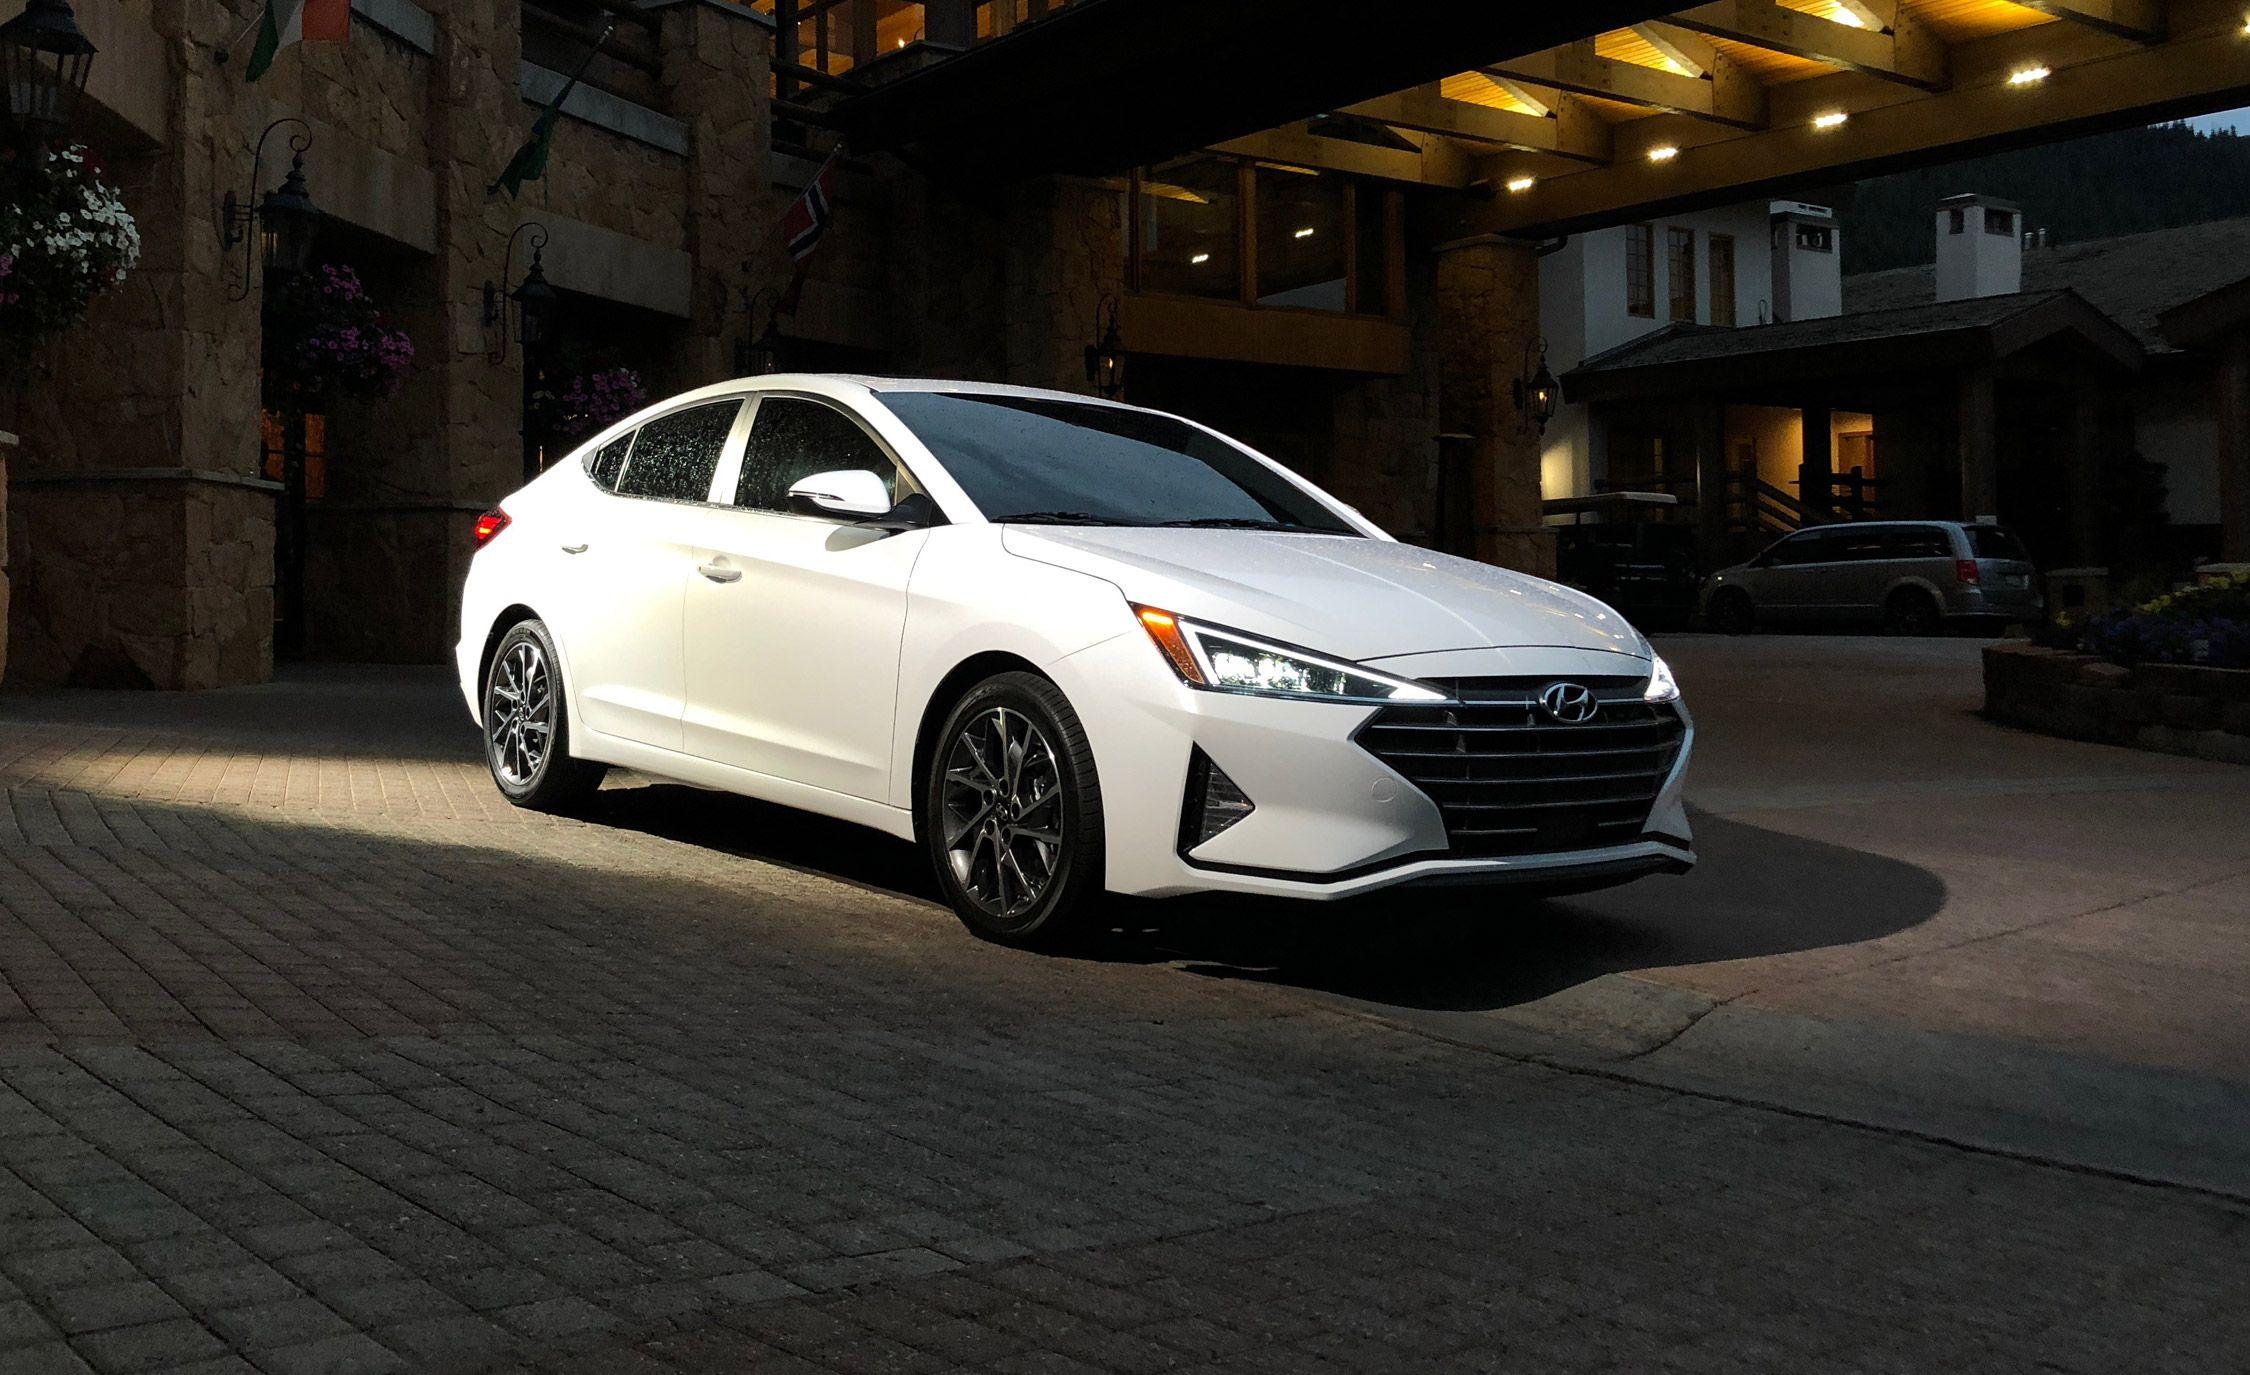 Refreshed 2019 Hyundai Elantra Sedan New Design More Safety Tech